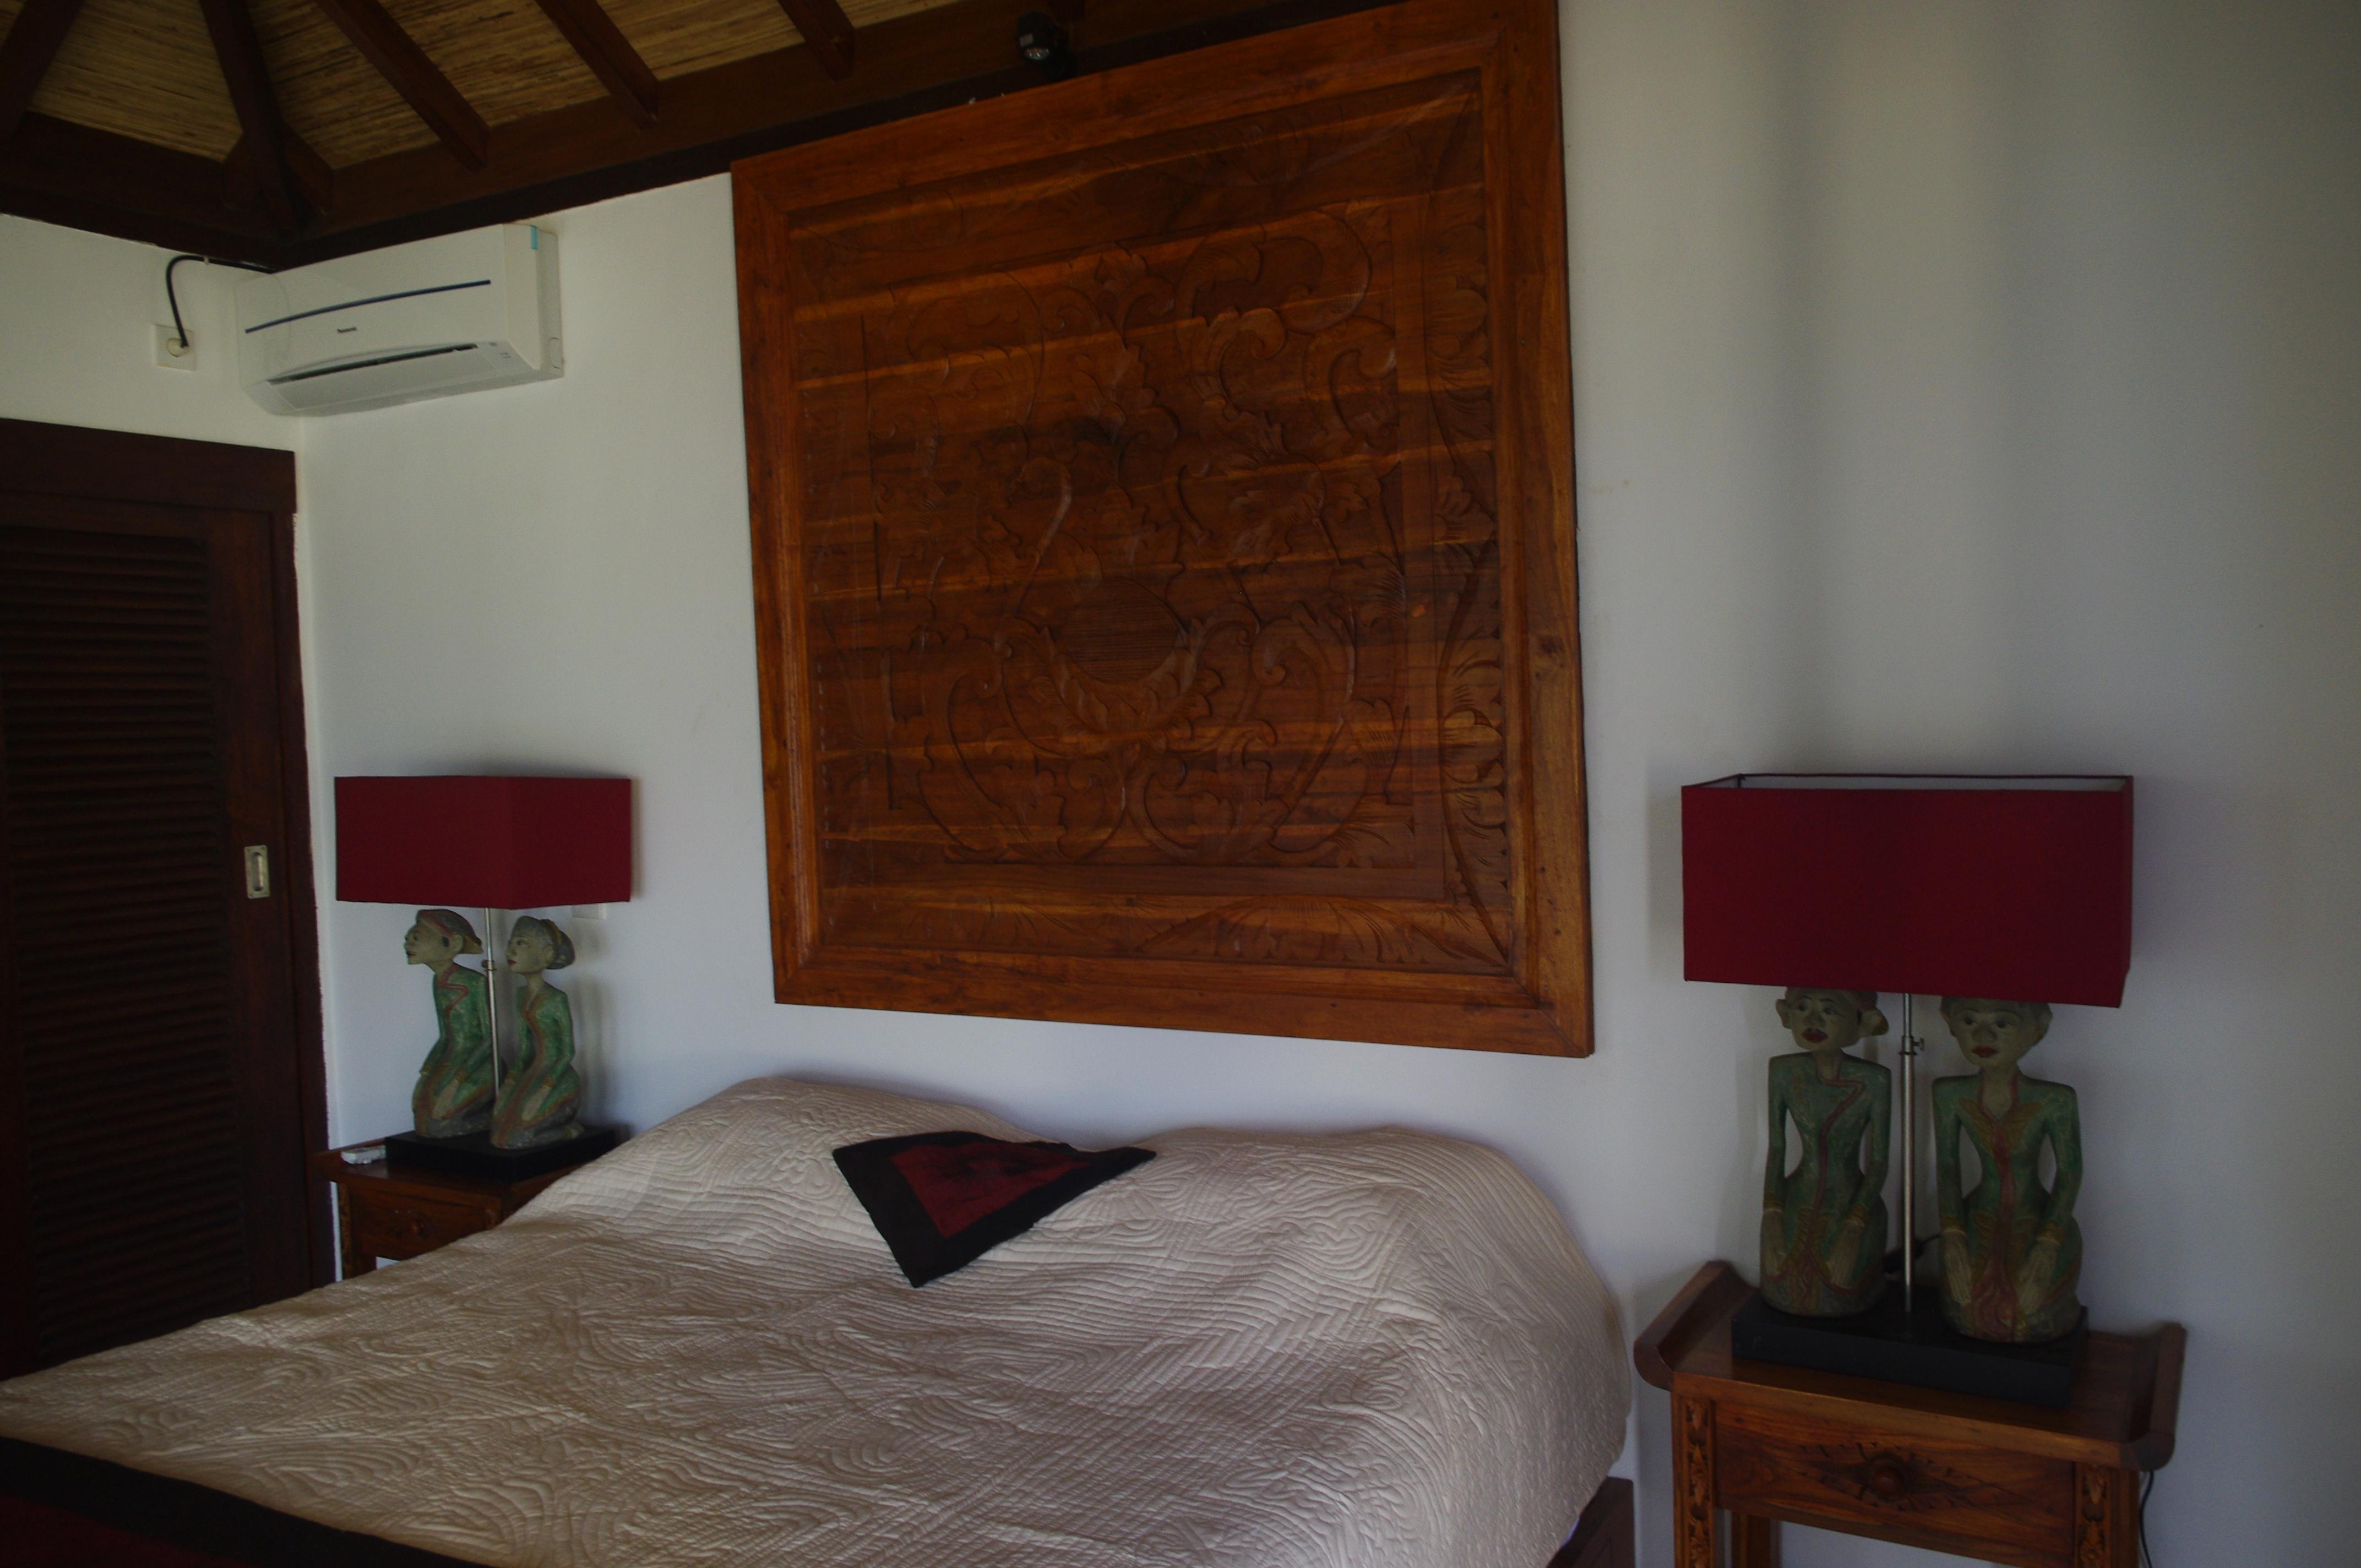 Salon De Jardin Original rumah kami - vila untuk disewakan di lovina/kayu putih, bali